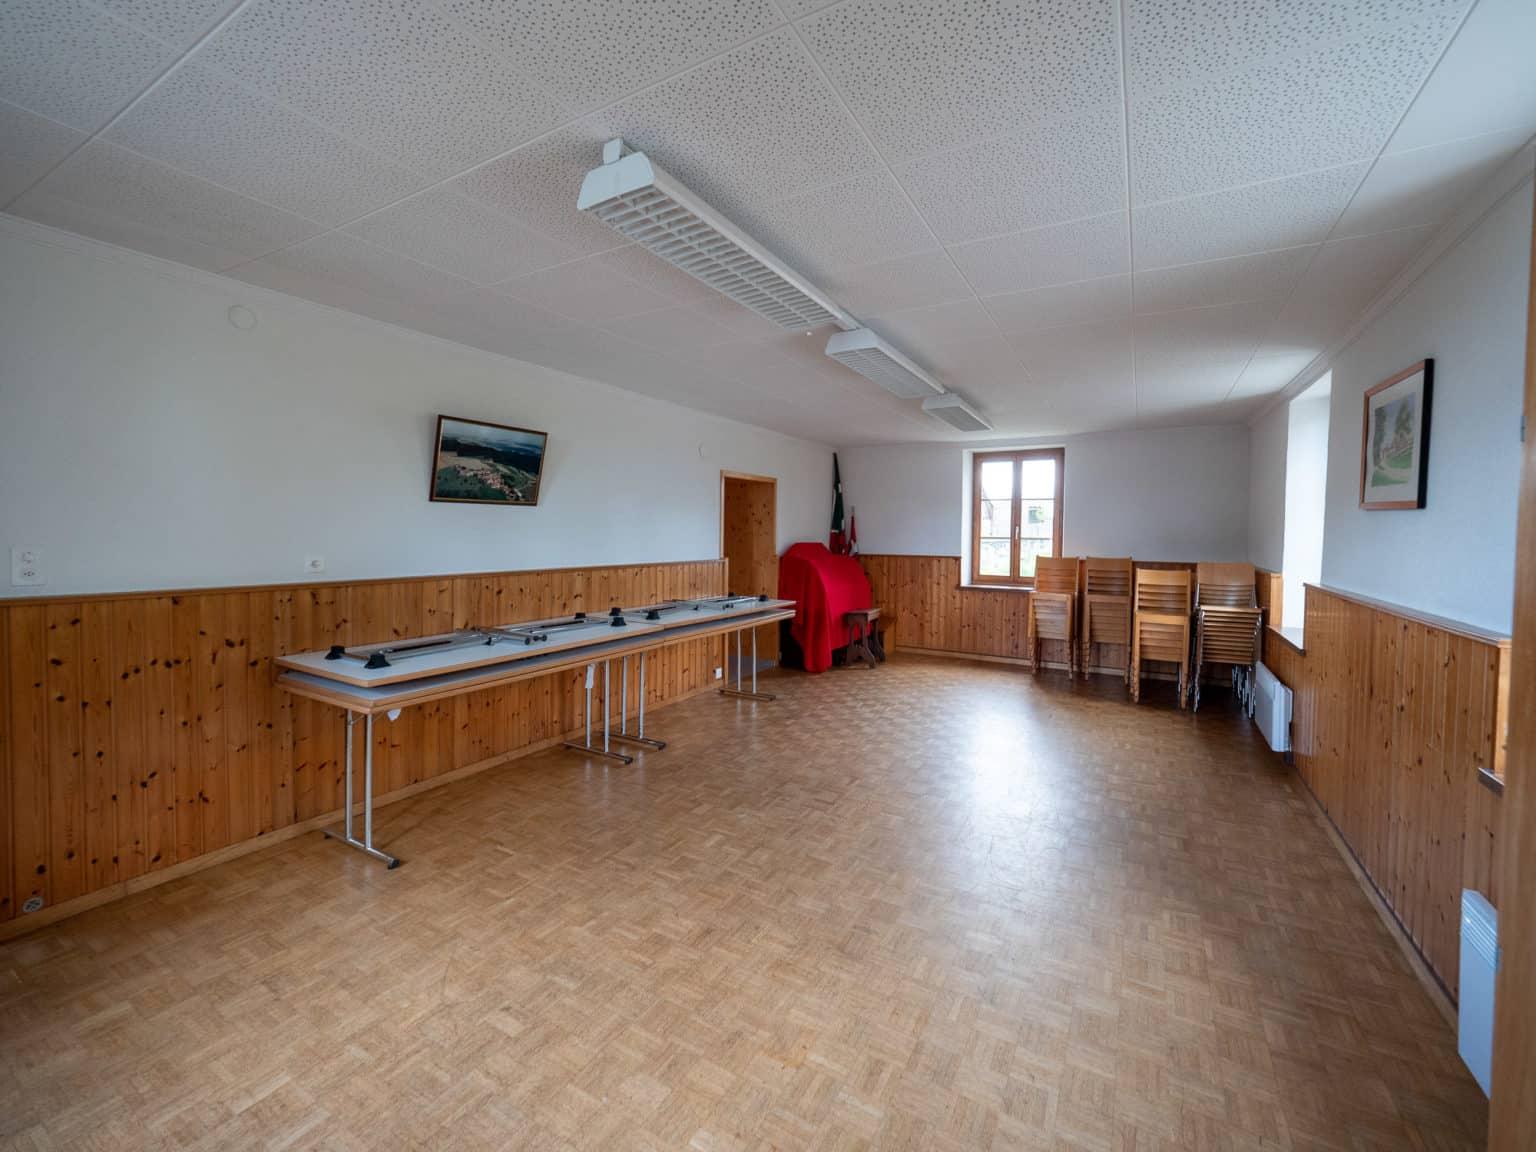 Refuges-salles-Montanaire©V-Dubach-52717